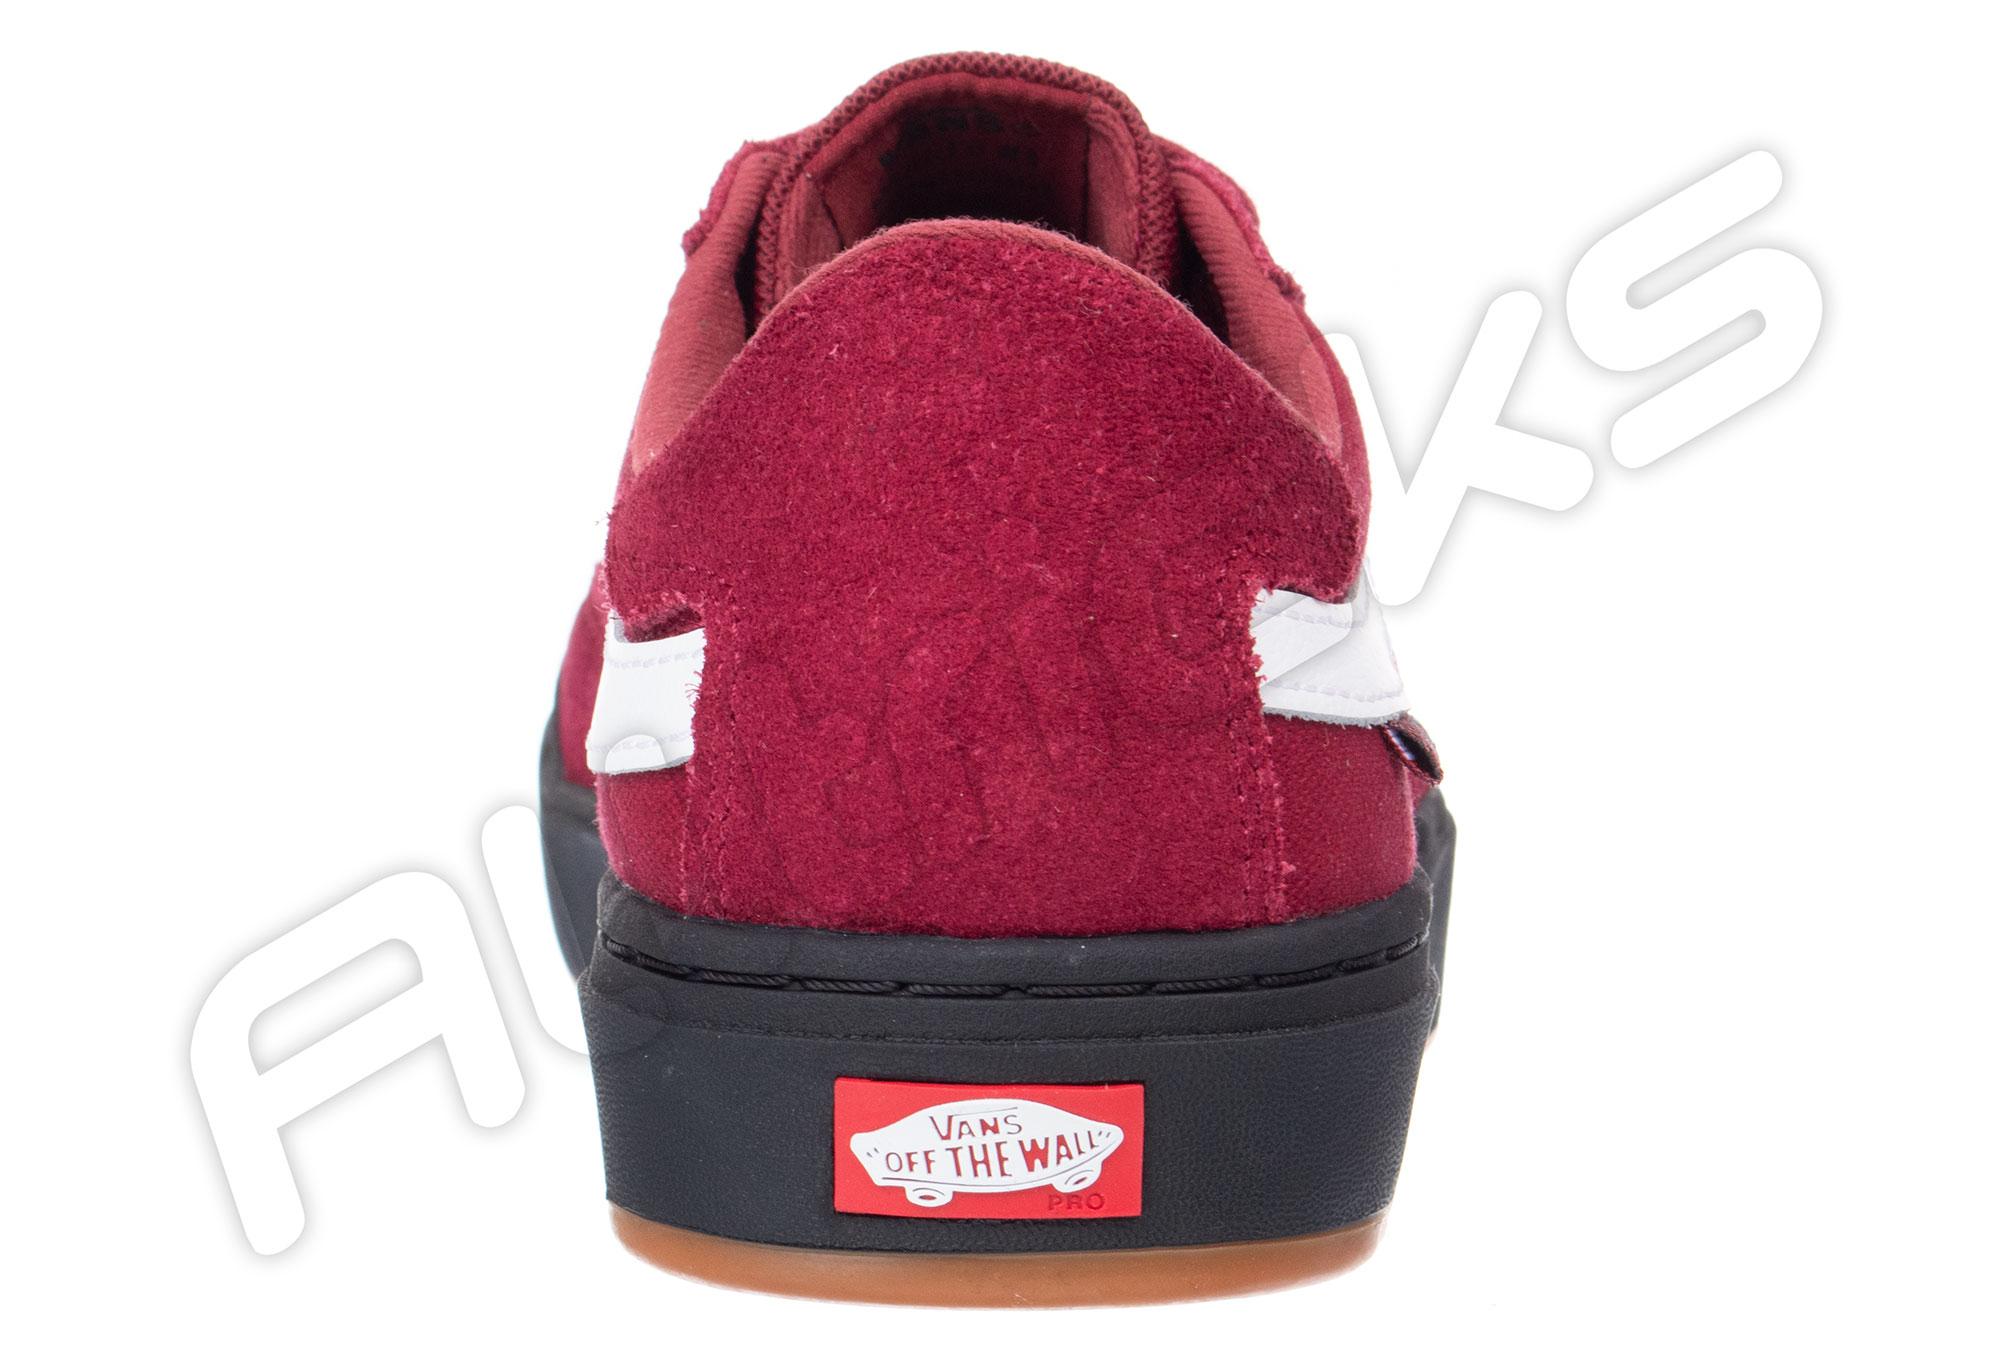 Vans Berle Pro Shoes Rumba Red